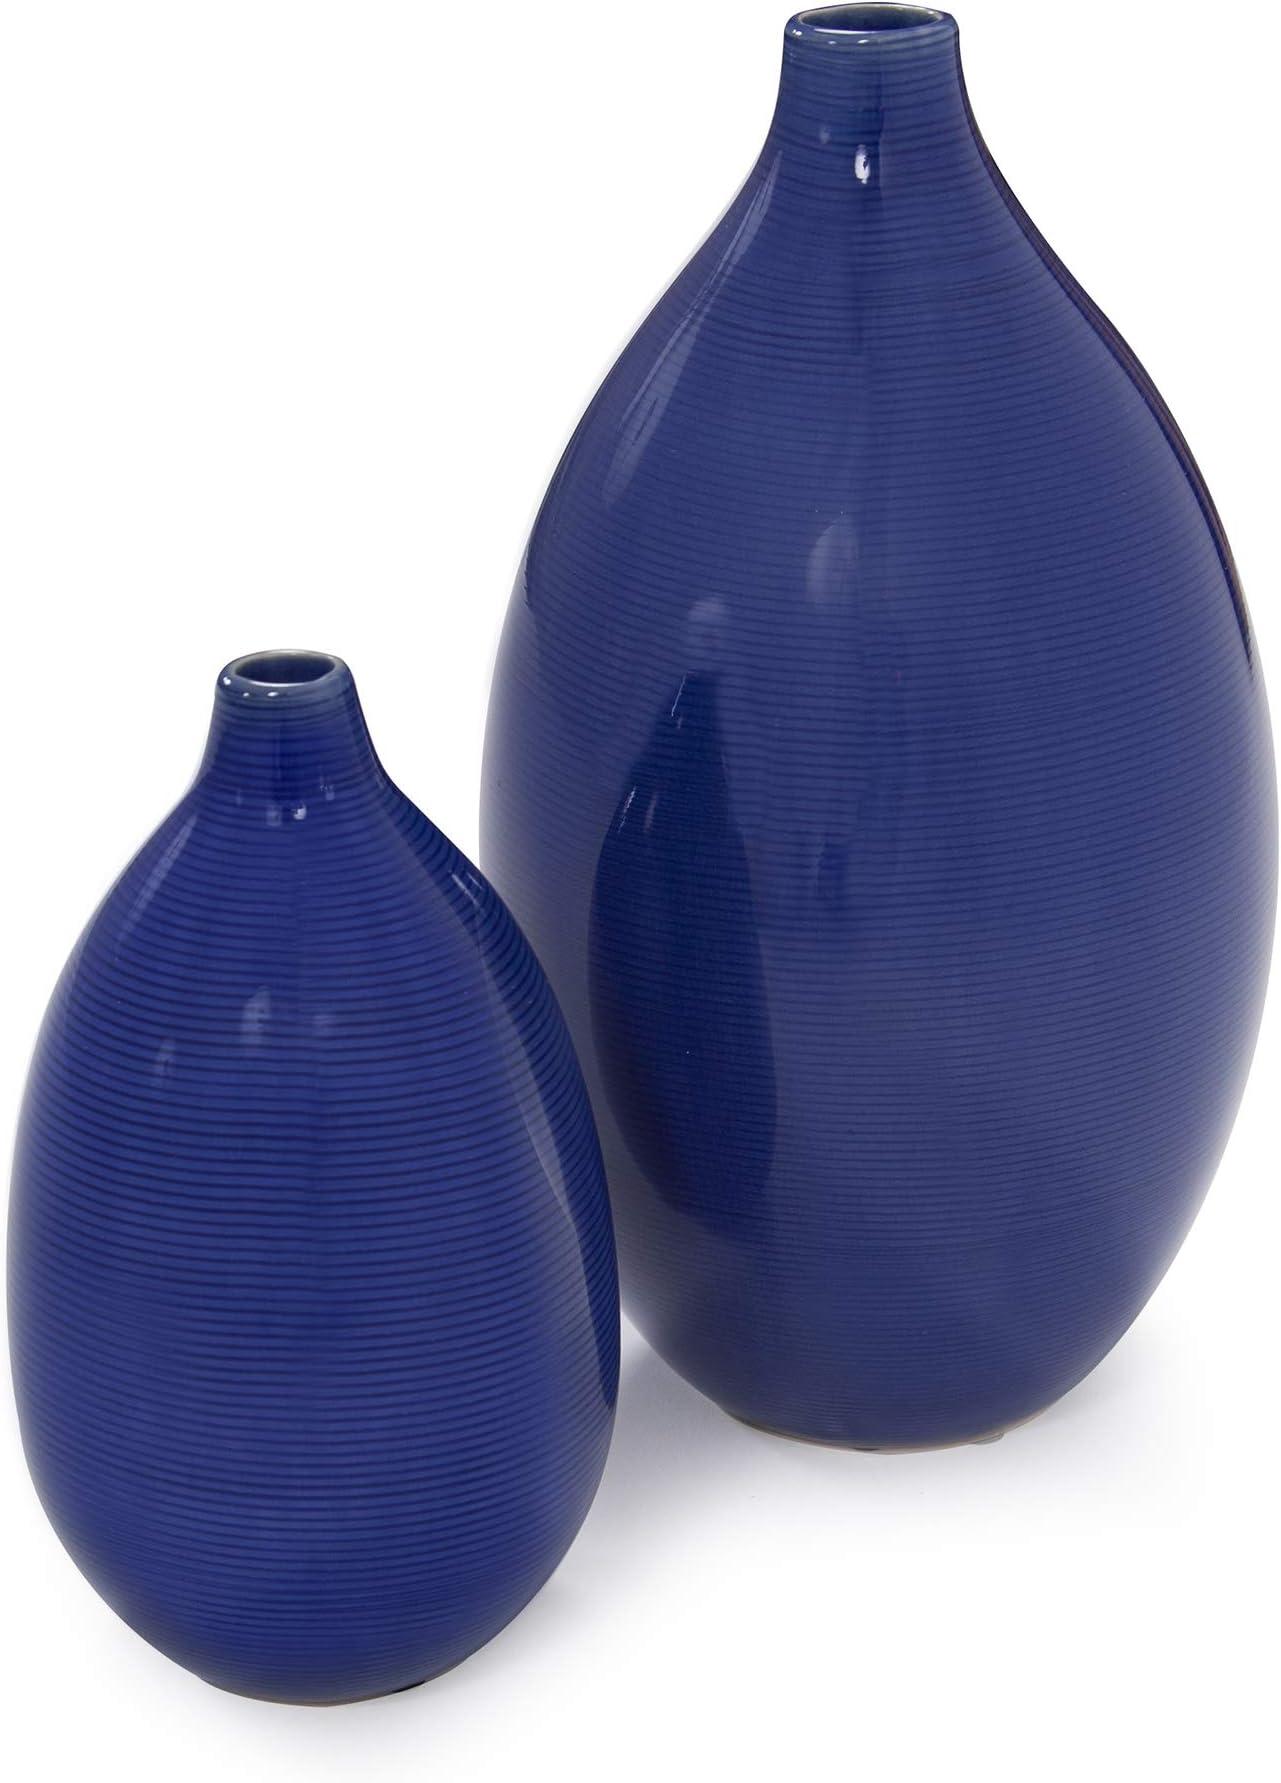 FREE SHIPPING Crystalline Glaze Porcelain Vase,Fine Art Pottery Vase 9 12  X  5